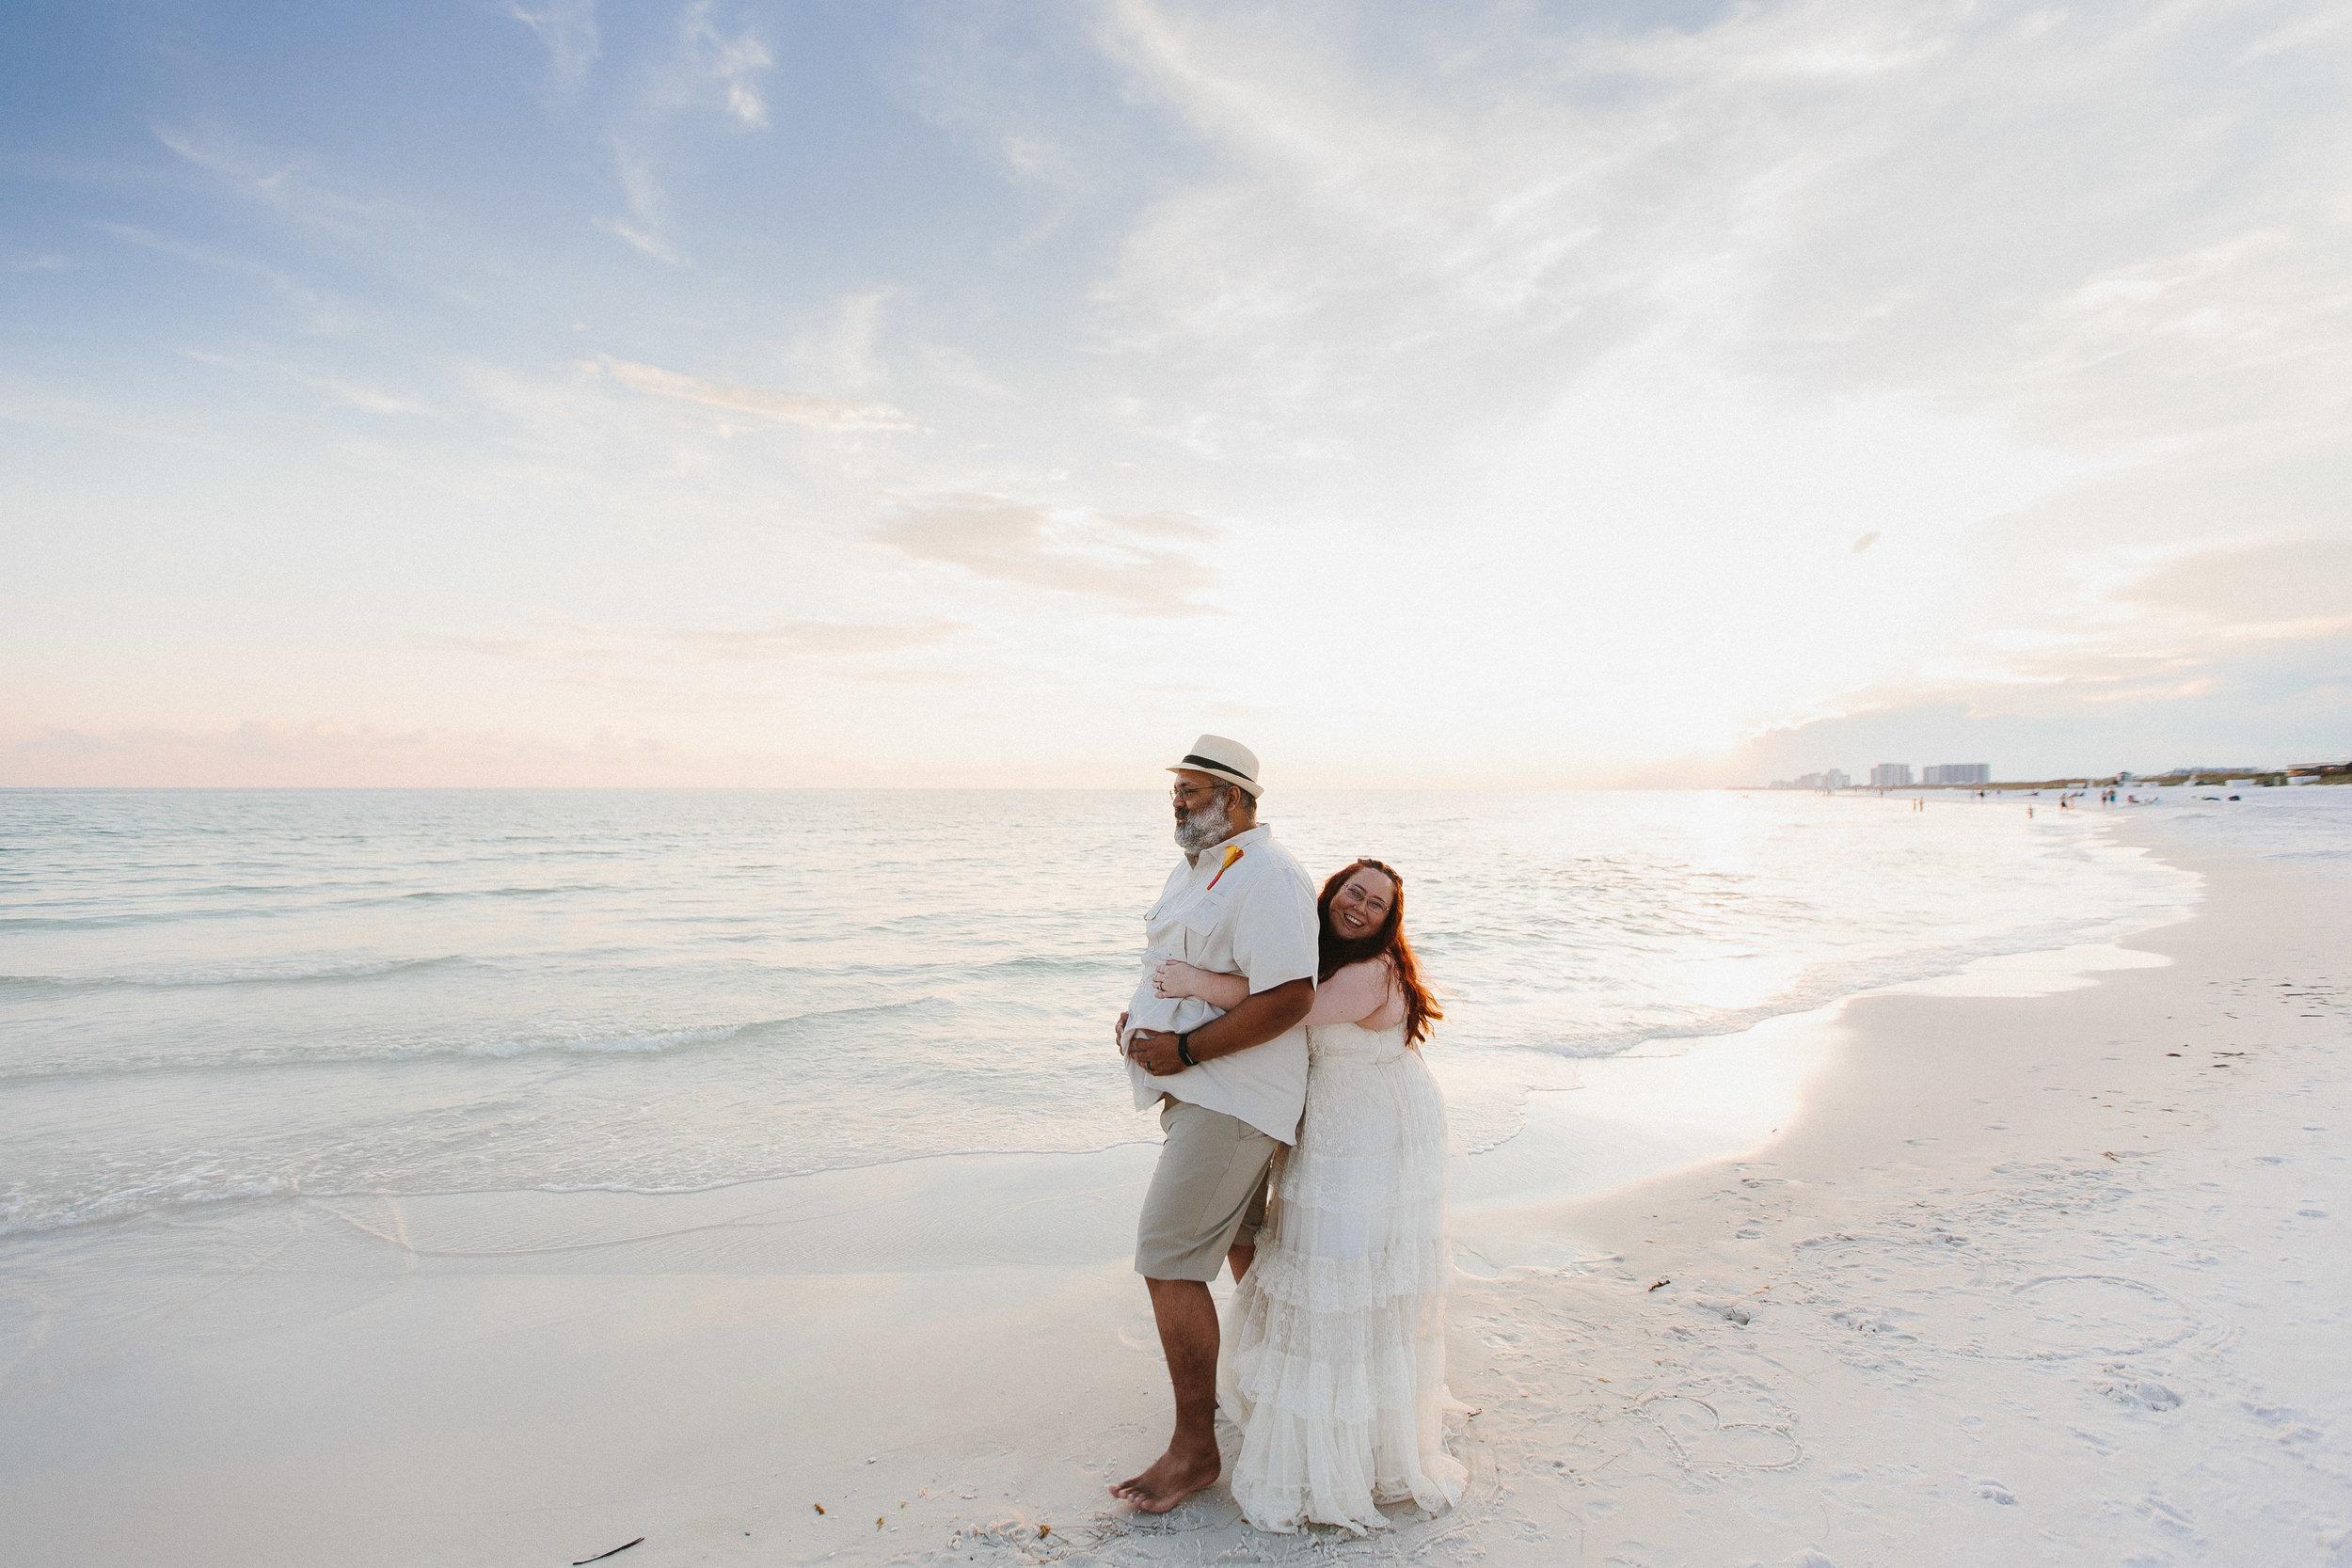 destin_sunset_beach_elopement_intimate_wedding_photographer_florida_documentary_1314.jpg